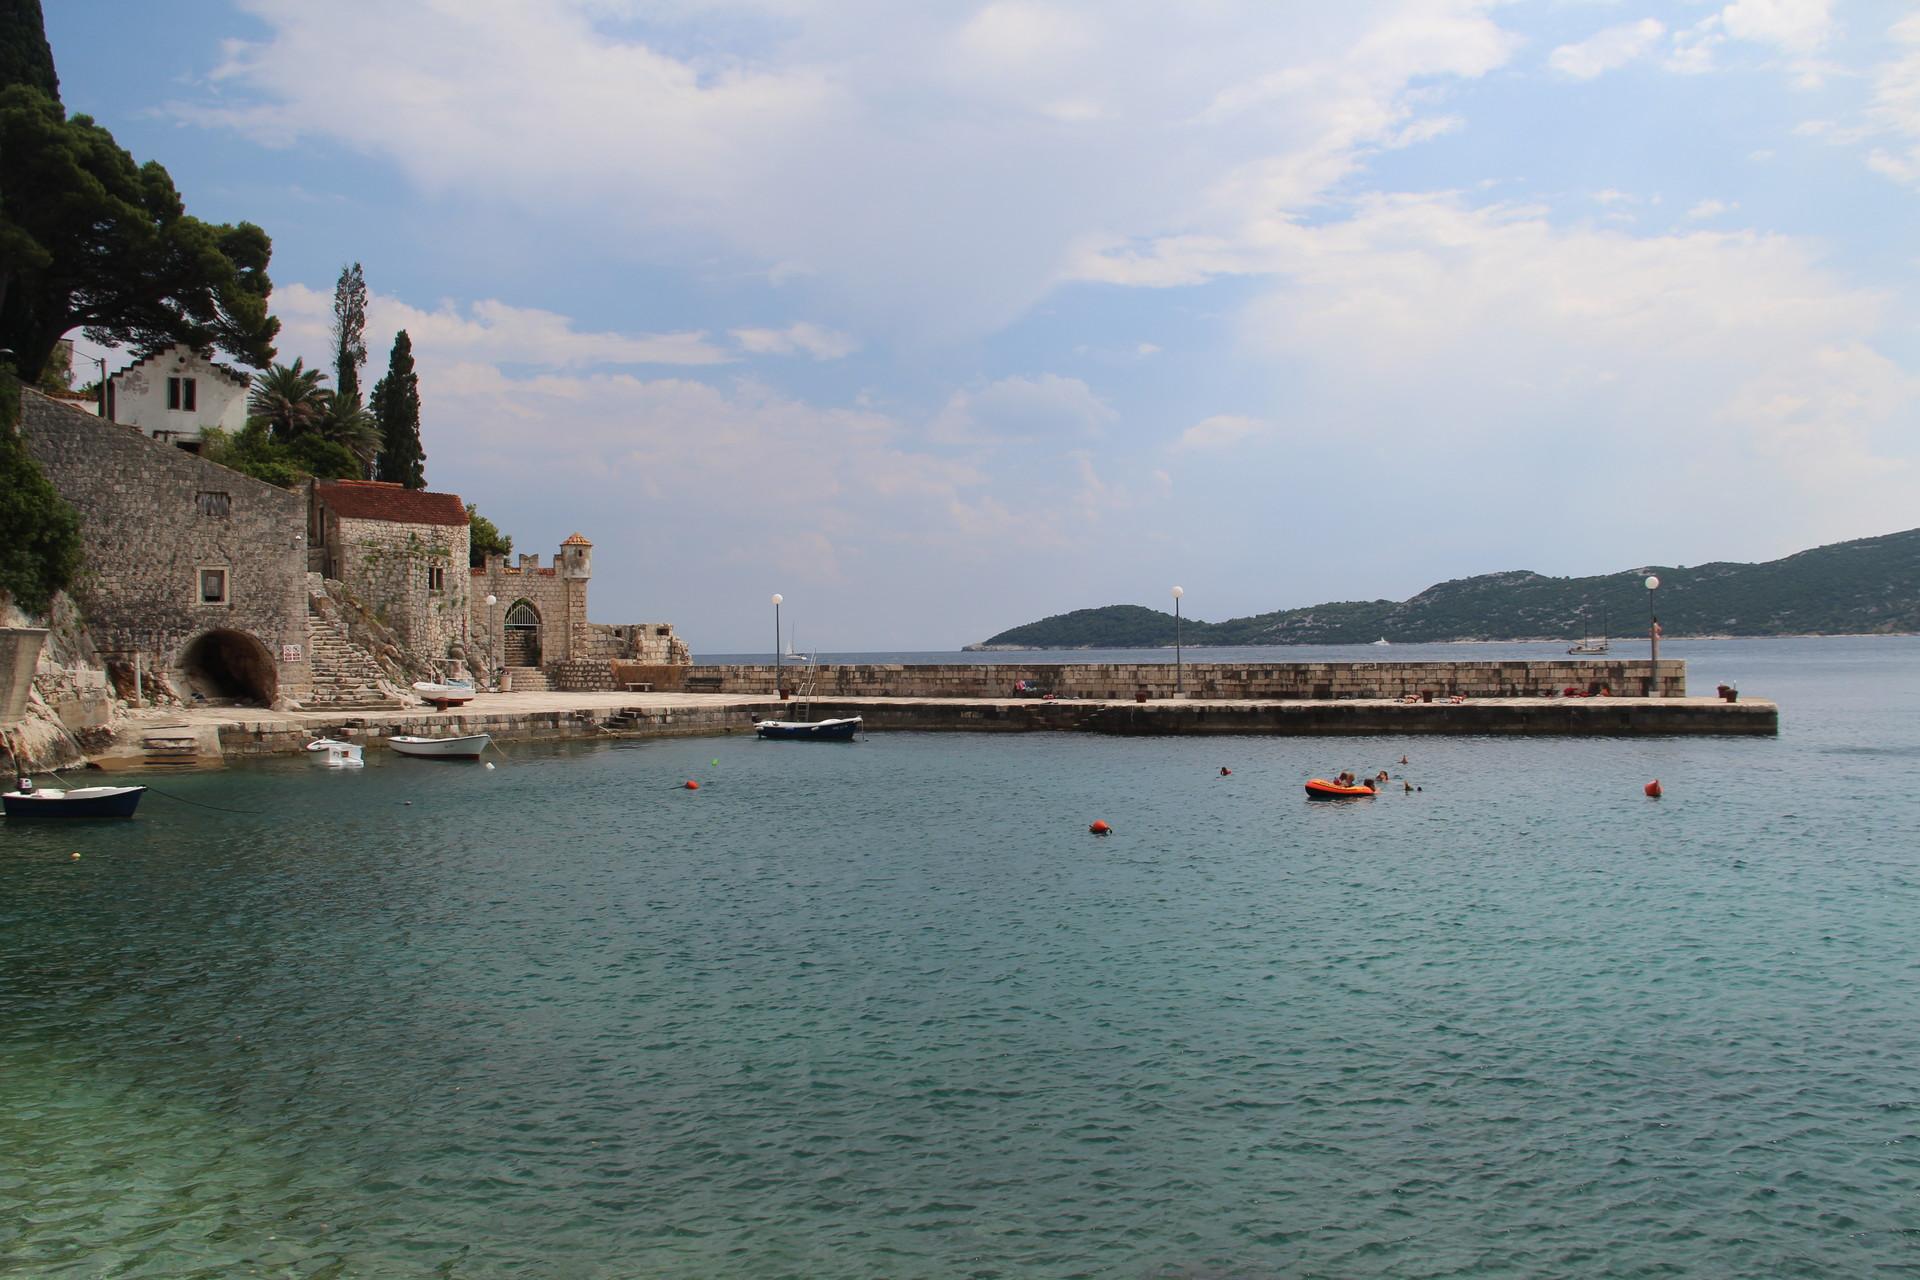 Le port de Trsteno